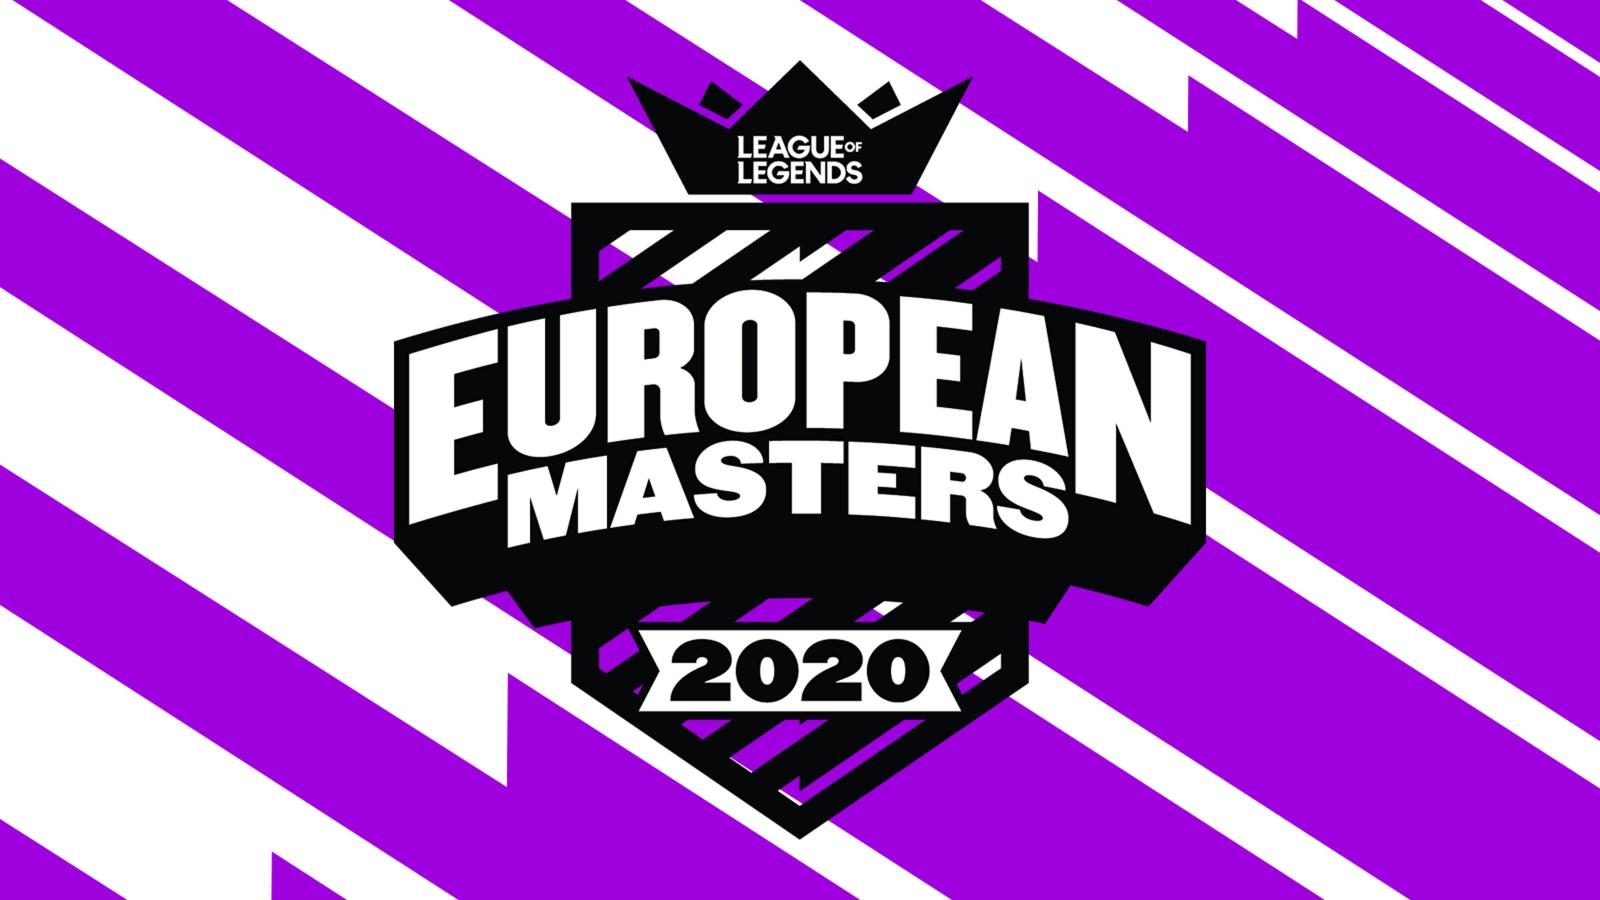 2020 European Masters LoL Fantasy Tips - Thursday 23rd April